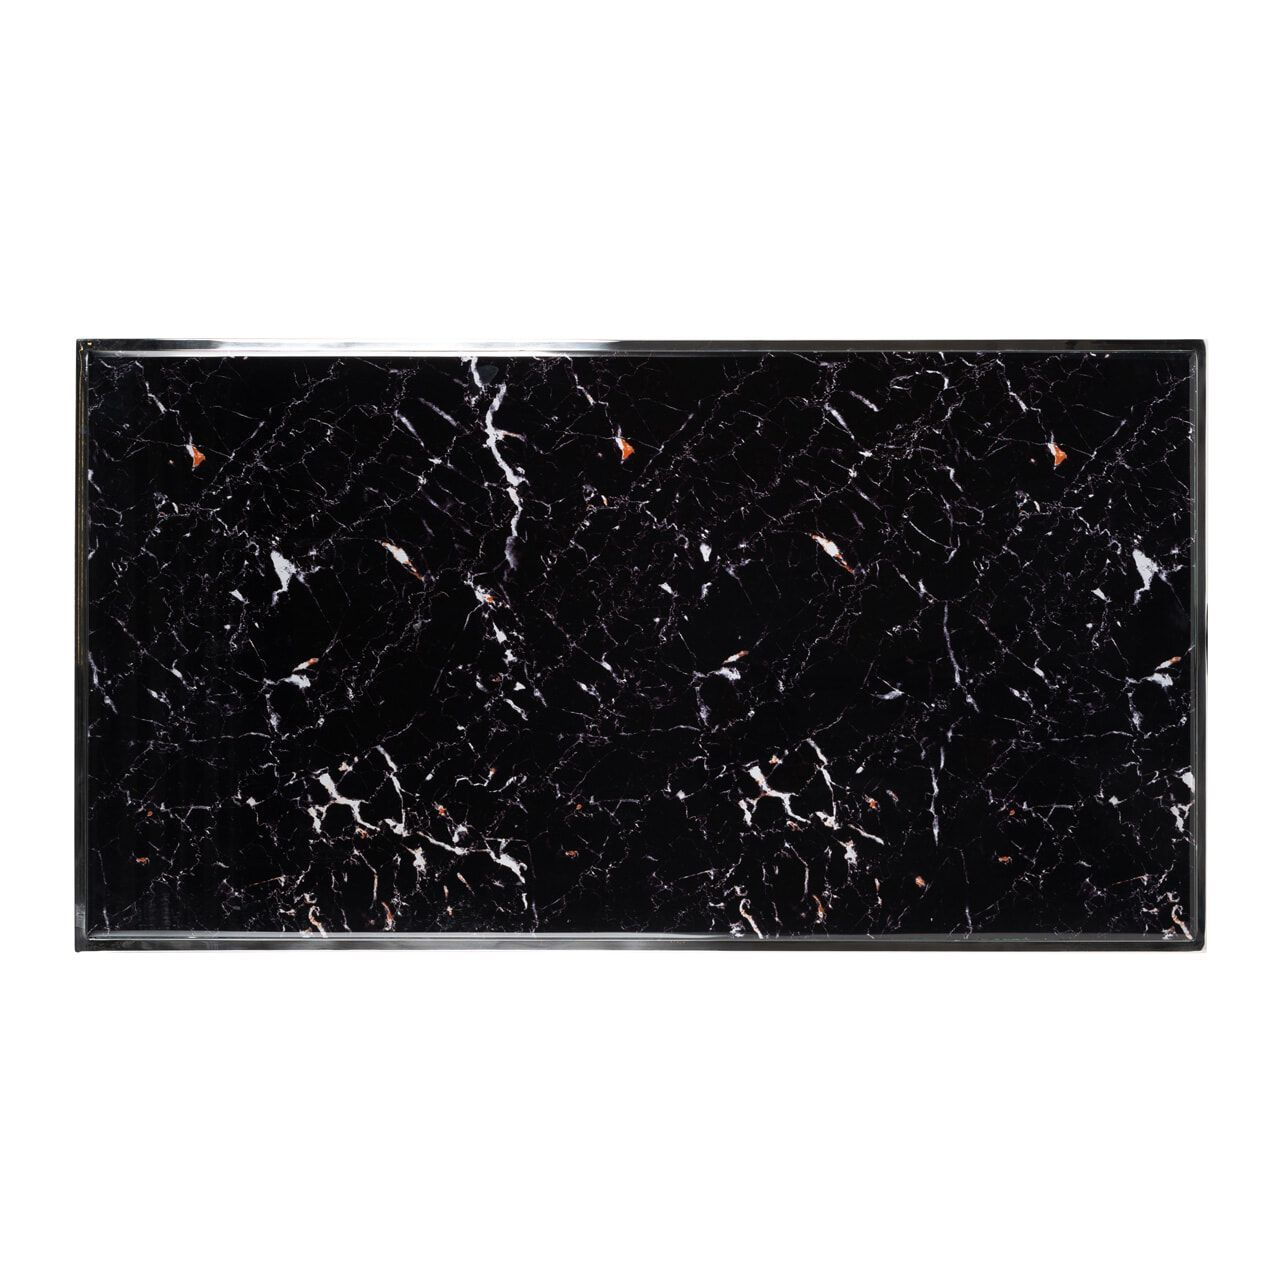 Richmond Salontafel 'Dante' Marble look, 120 x 65cm